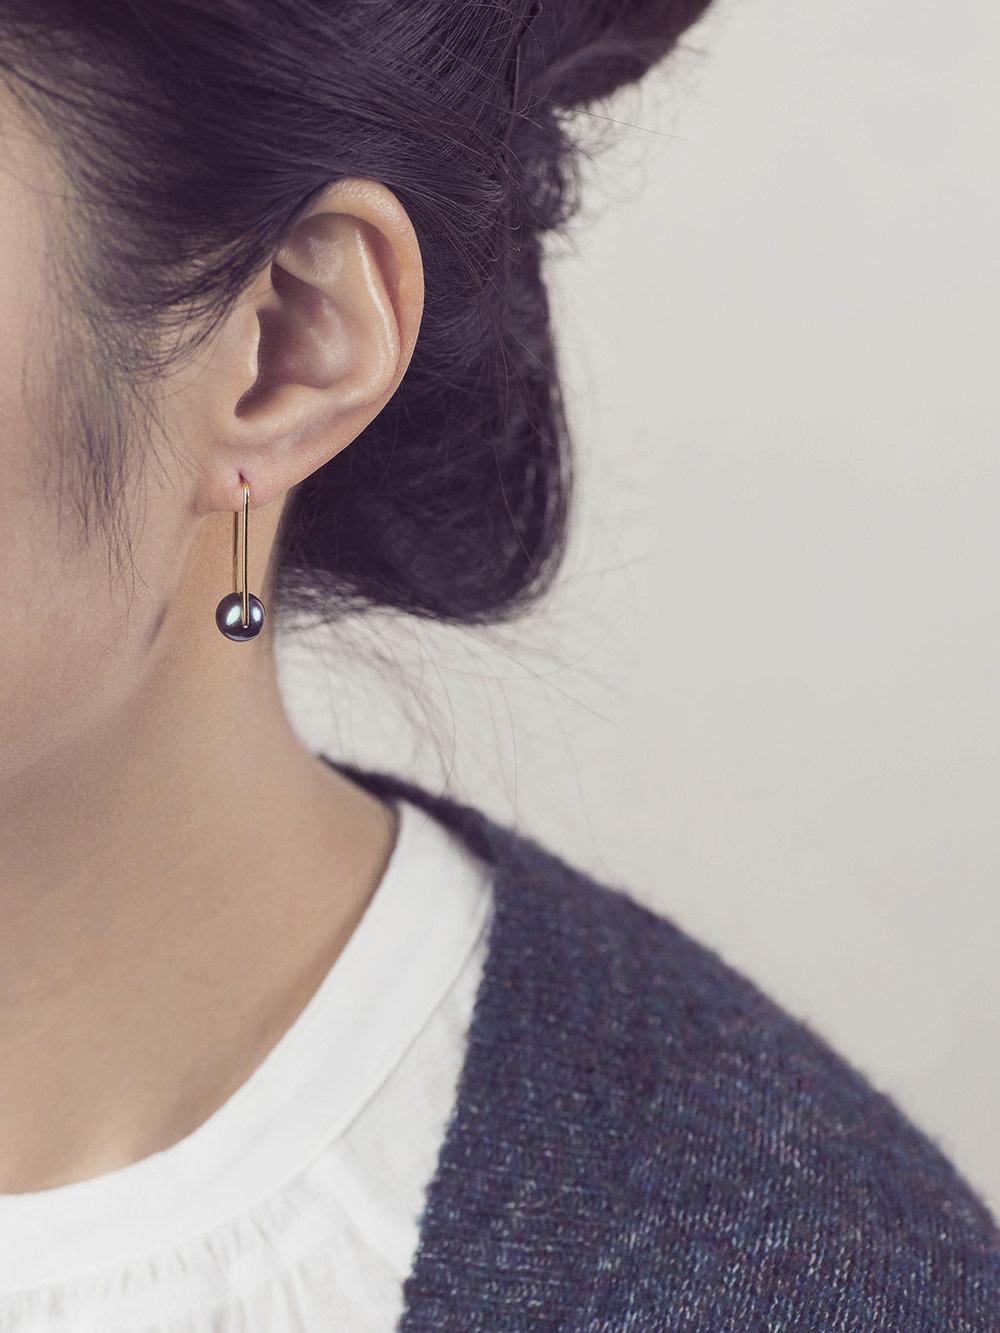 Perlen Ohrhänger, lang in 585 Gold und echten Süßwasserzuchtperlen/ Pearl earrings, long in 14kt gold and sweetwater pearls